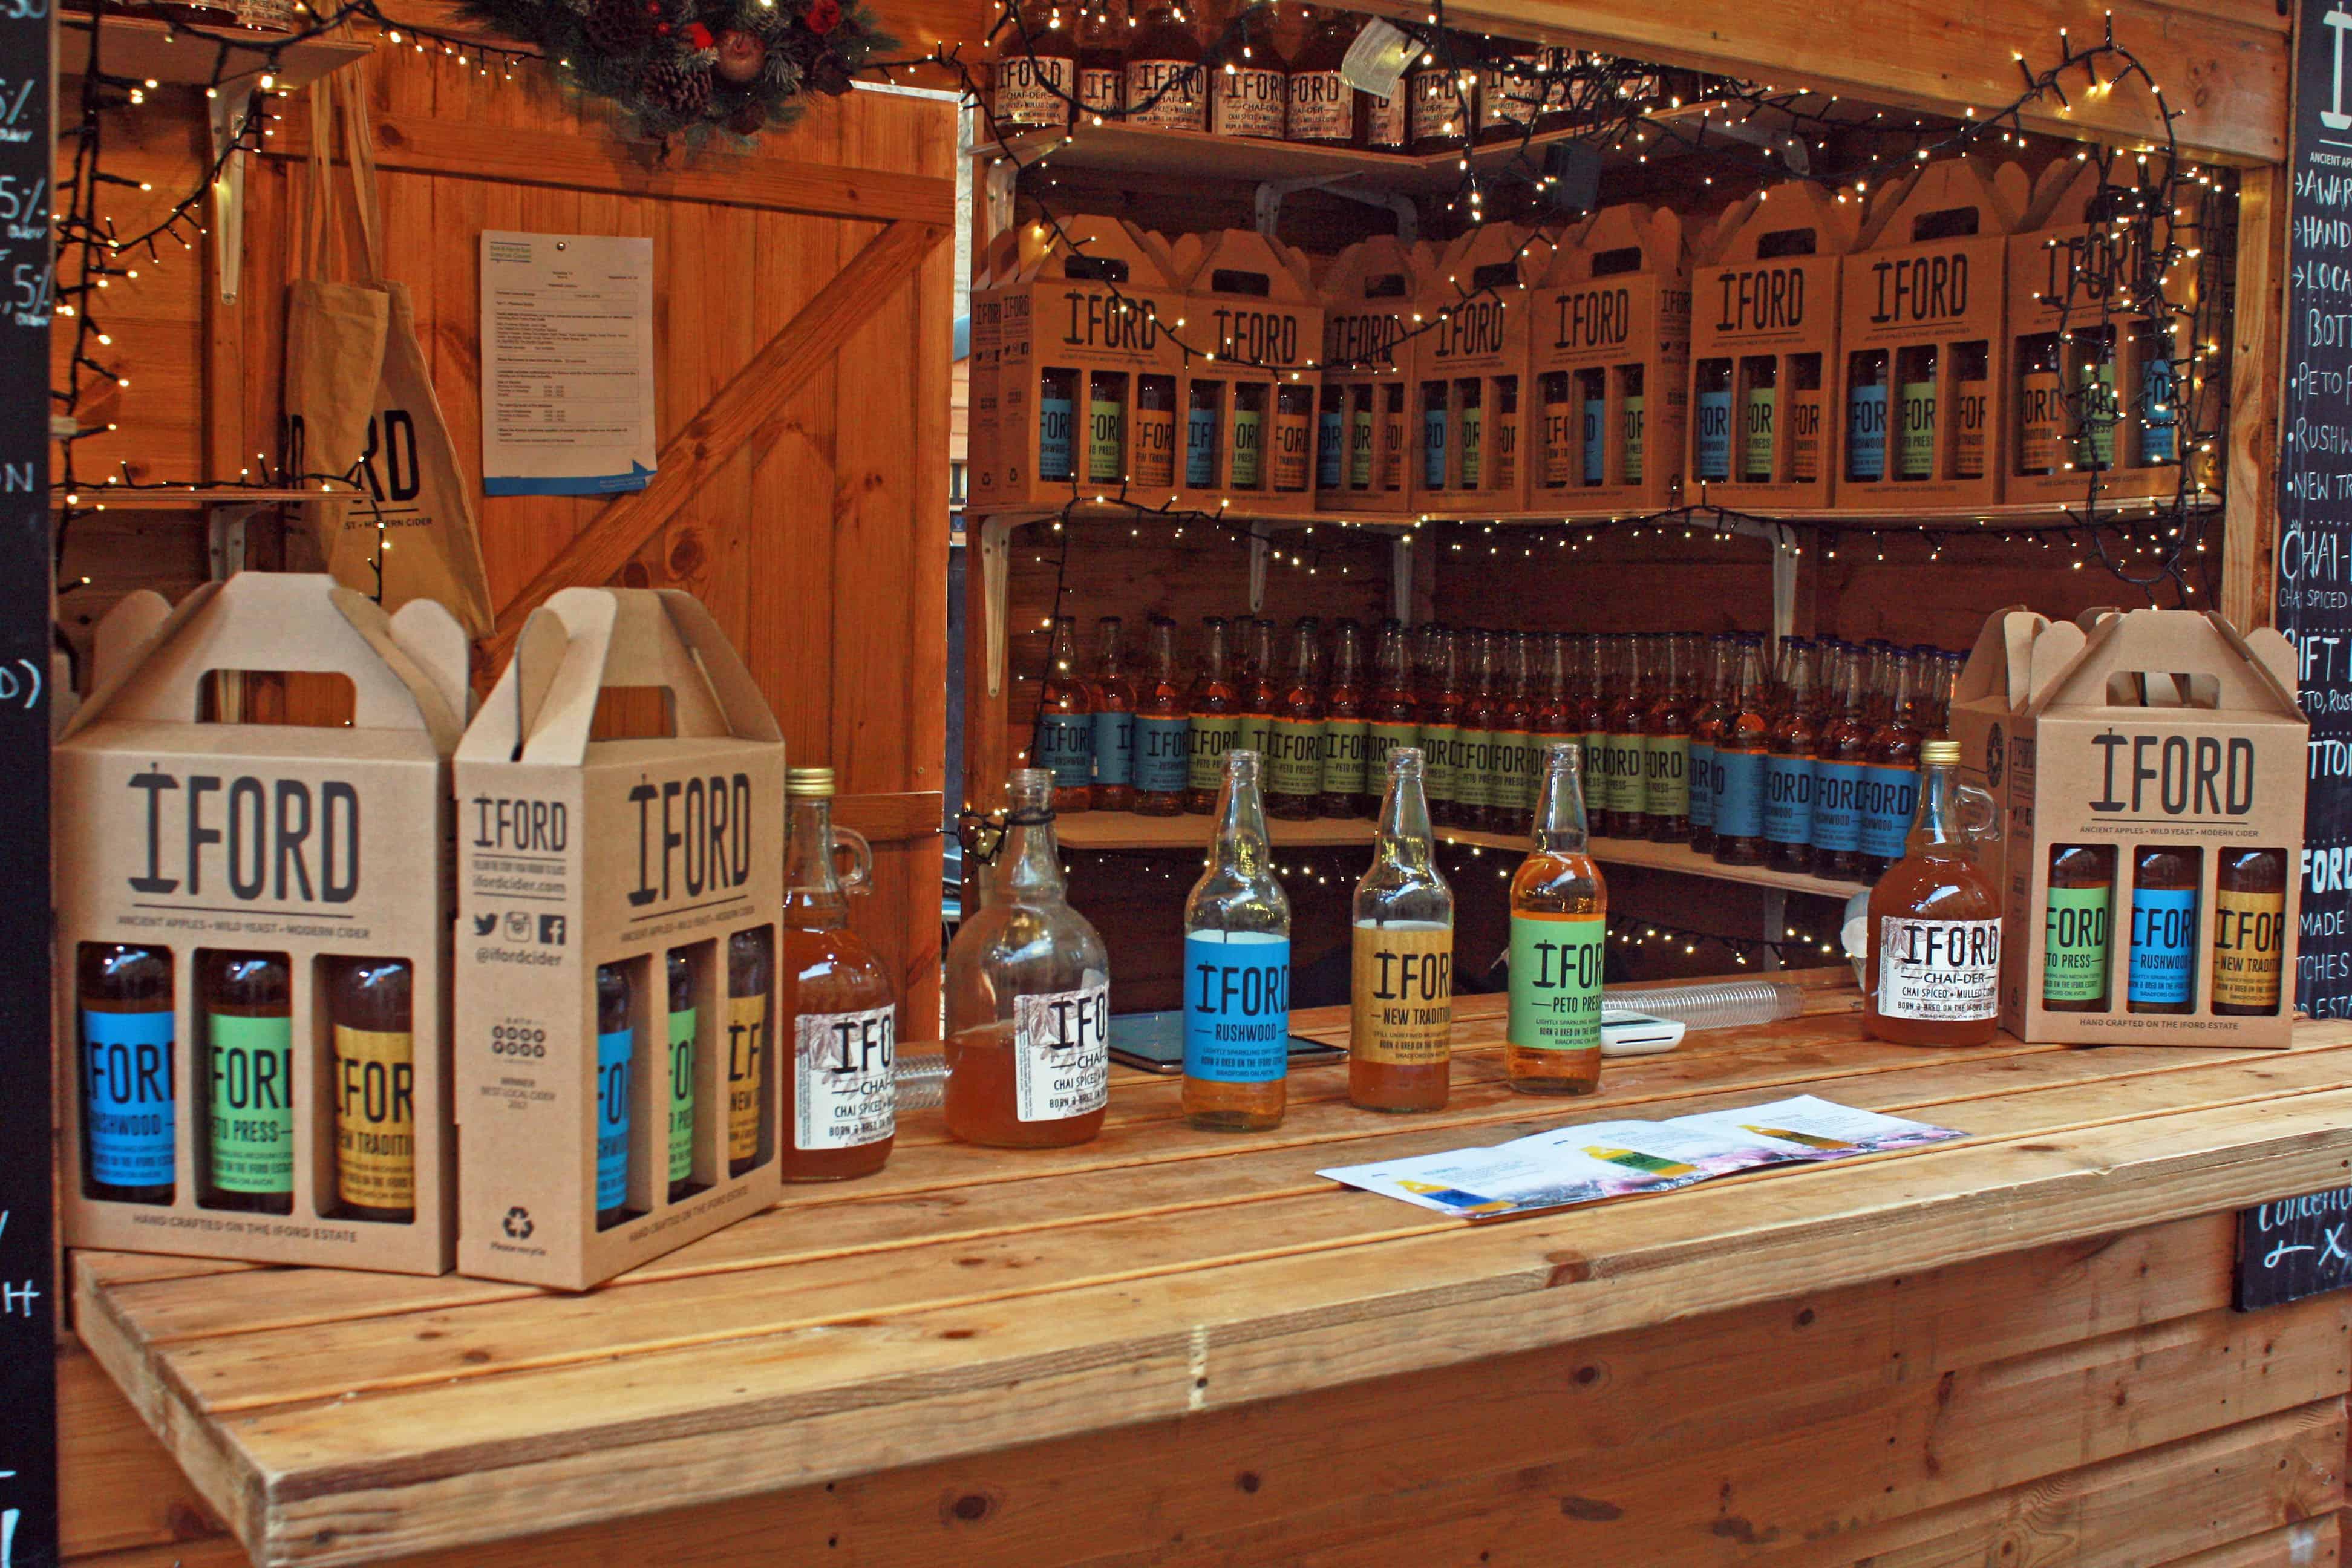 Iford Cider stall, Bath Christmas Market